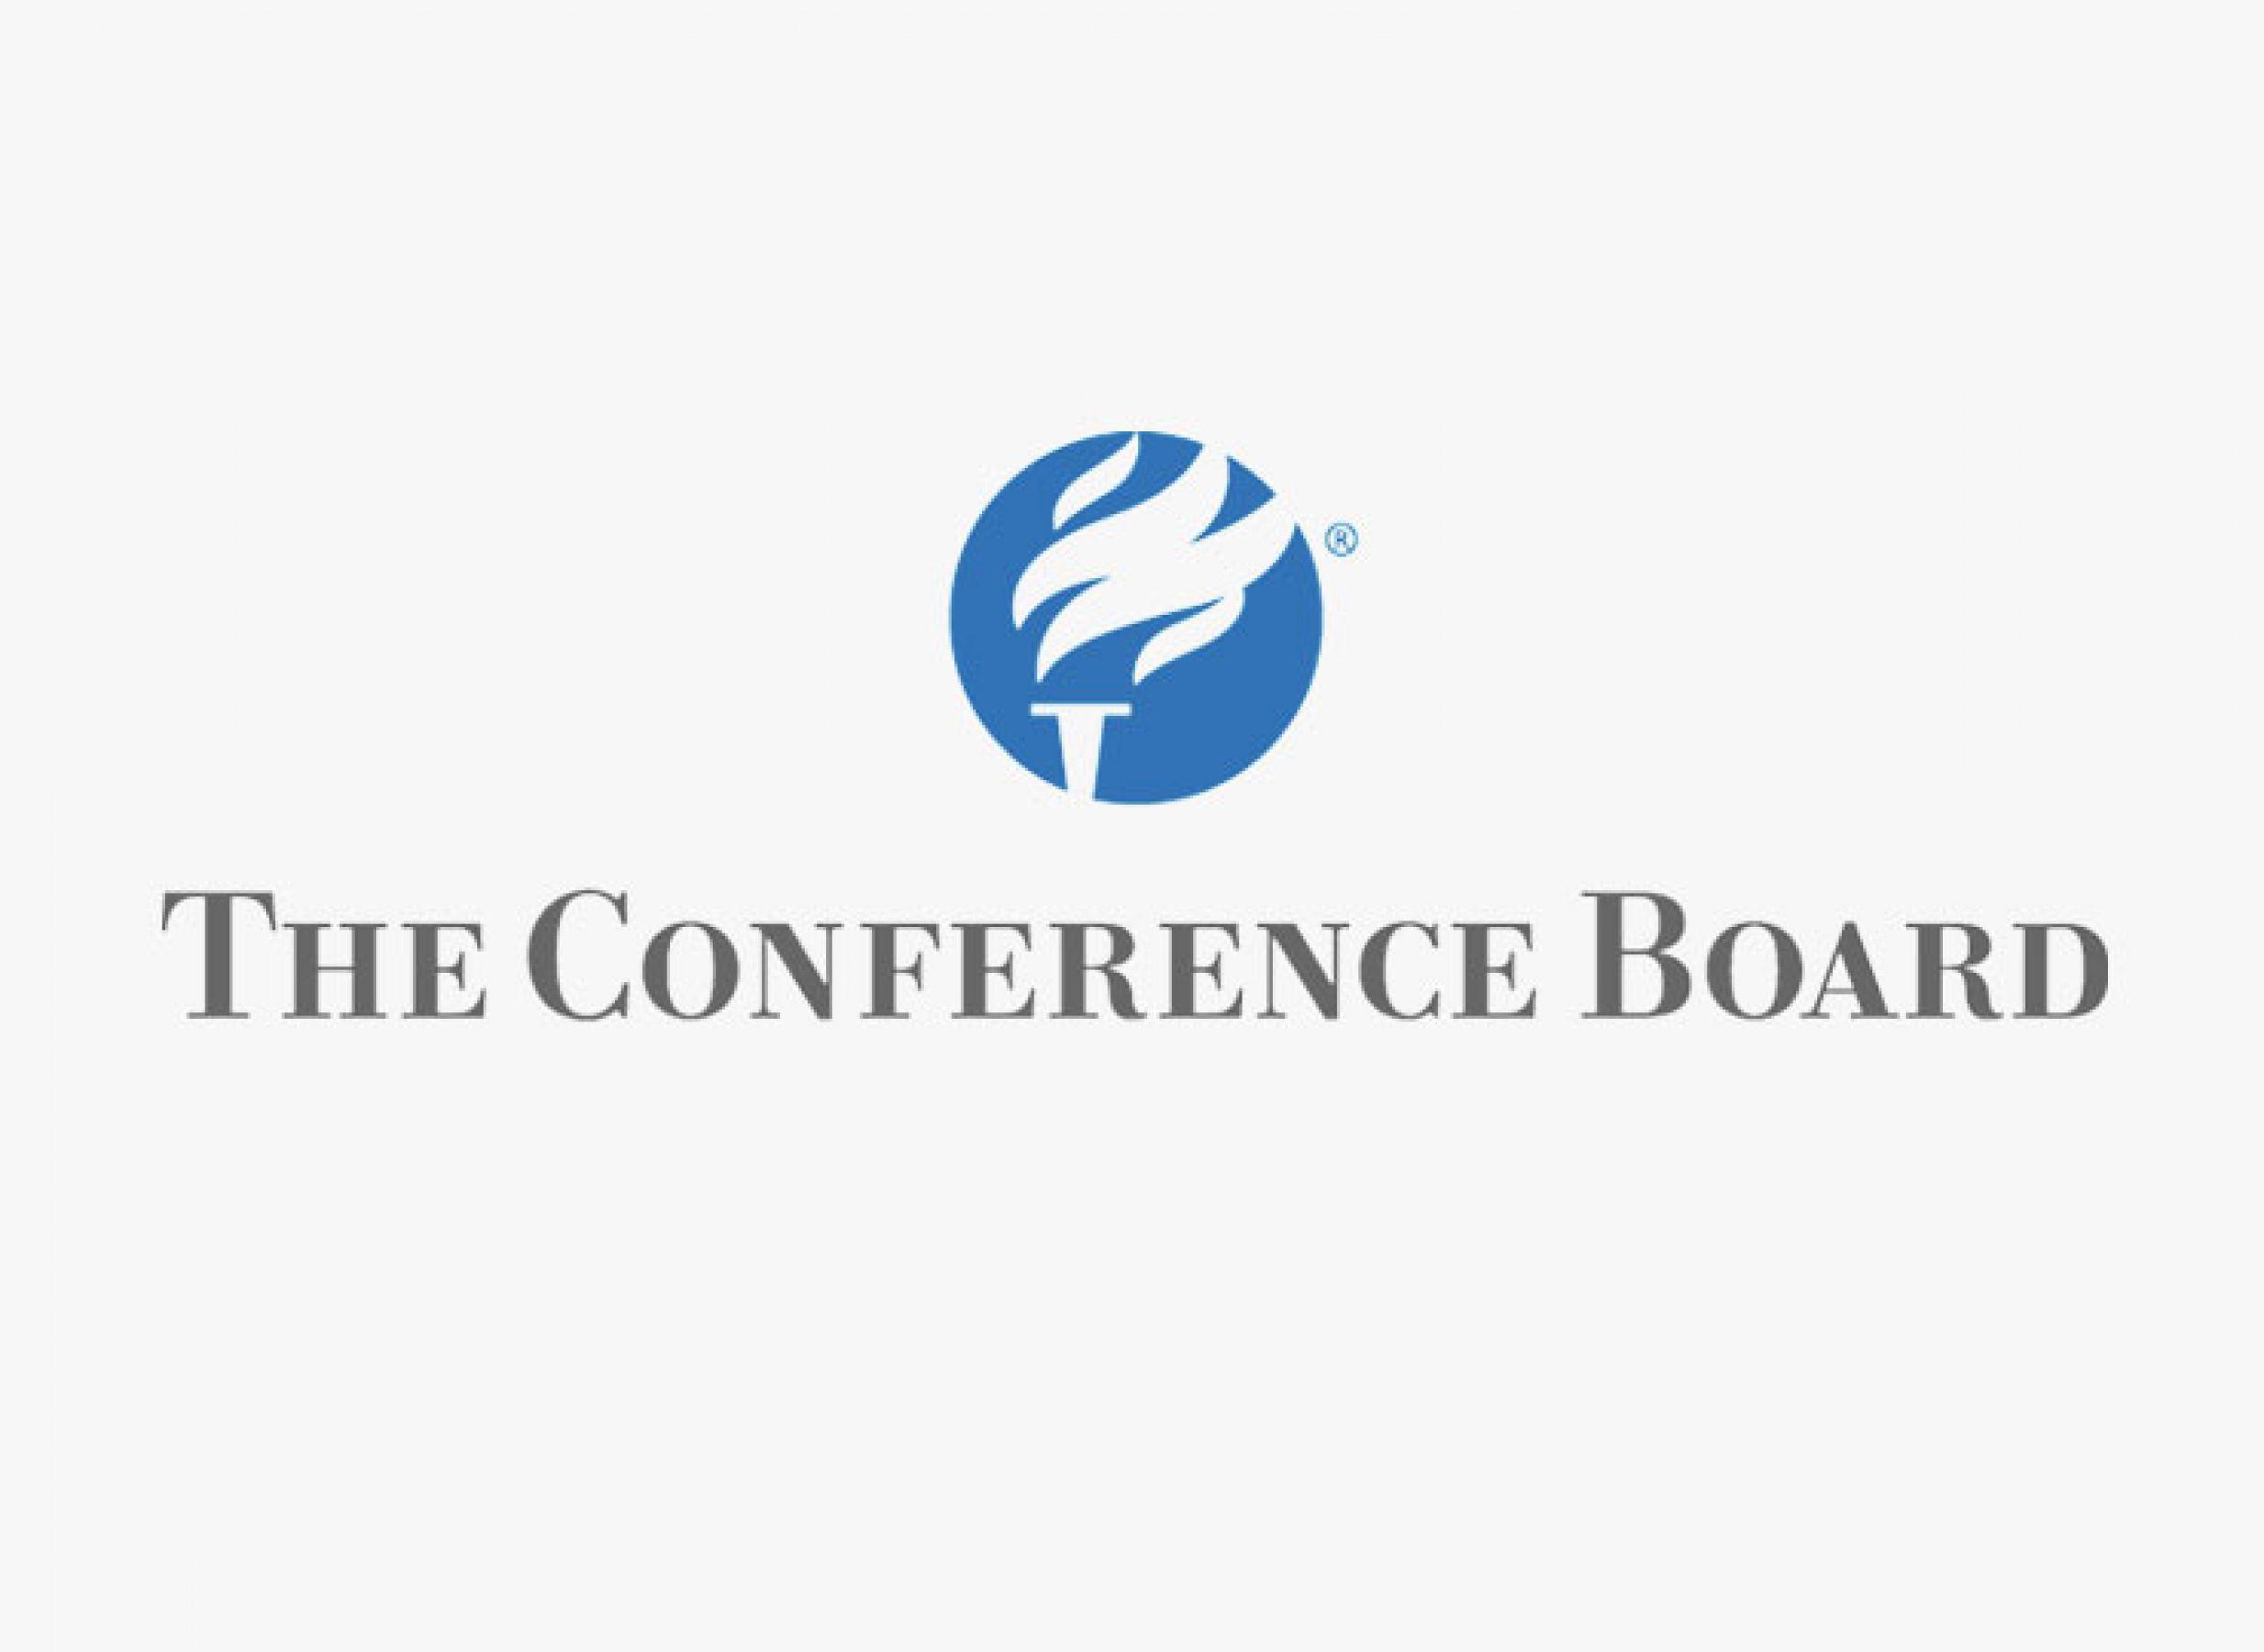 Claude Shaw interviews Matt Levine for The Conference Board